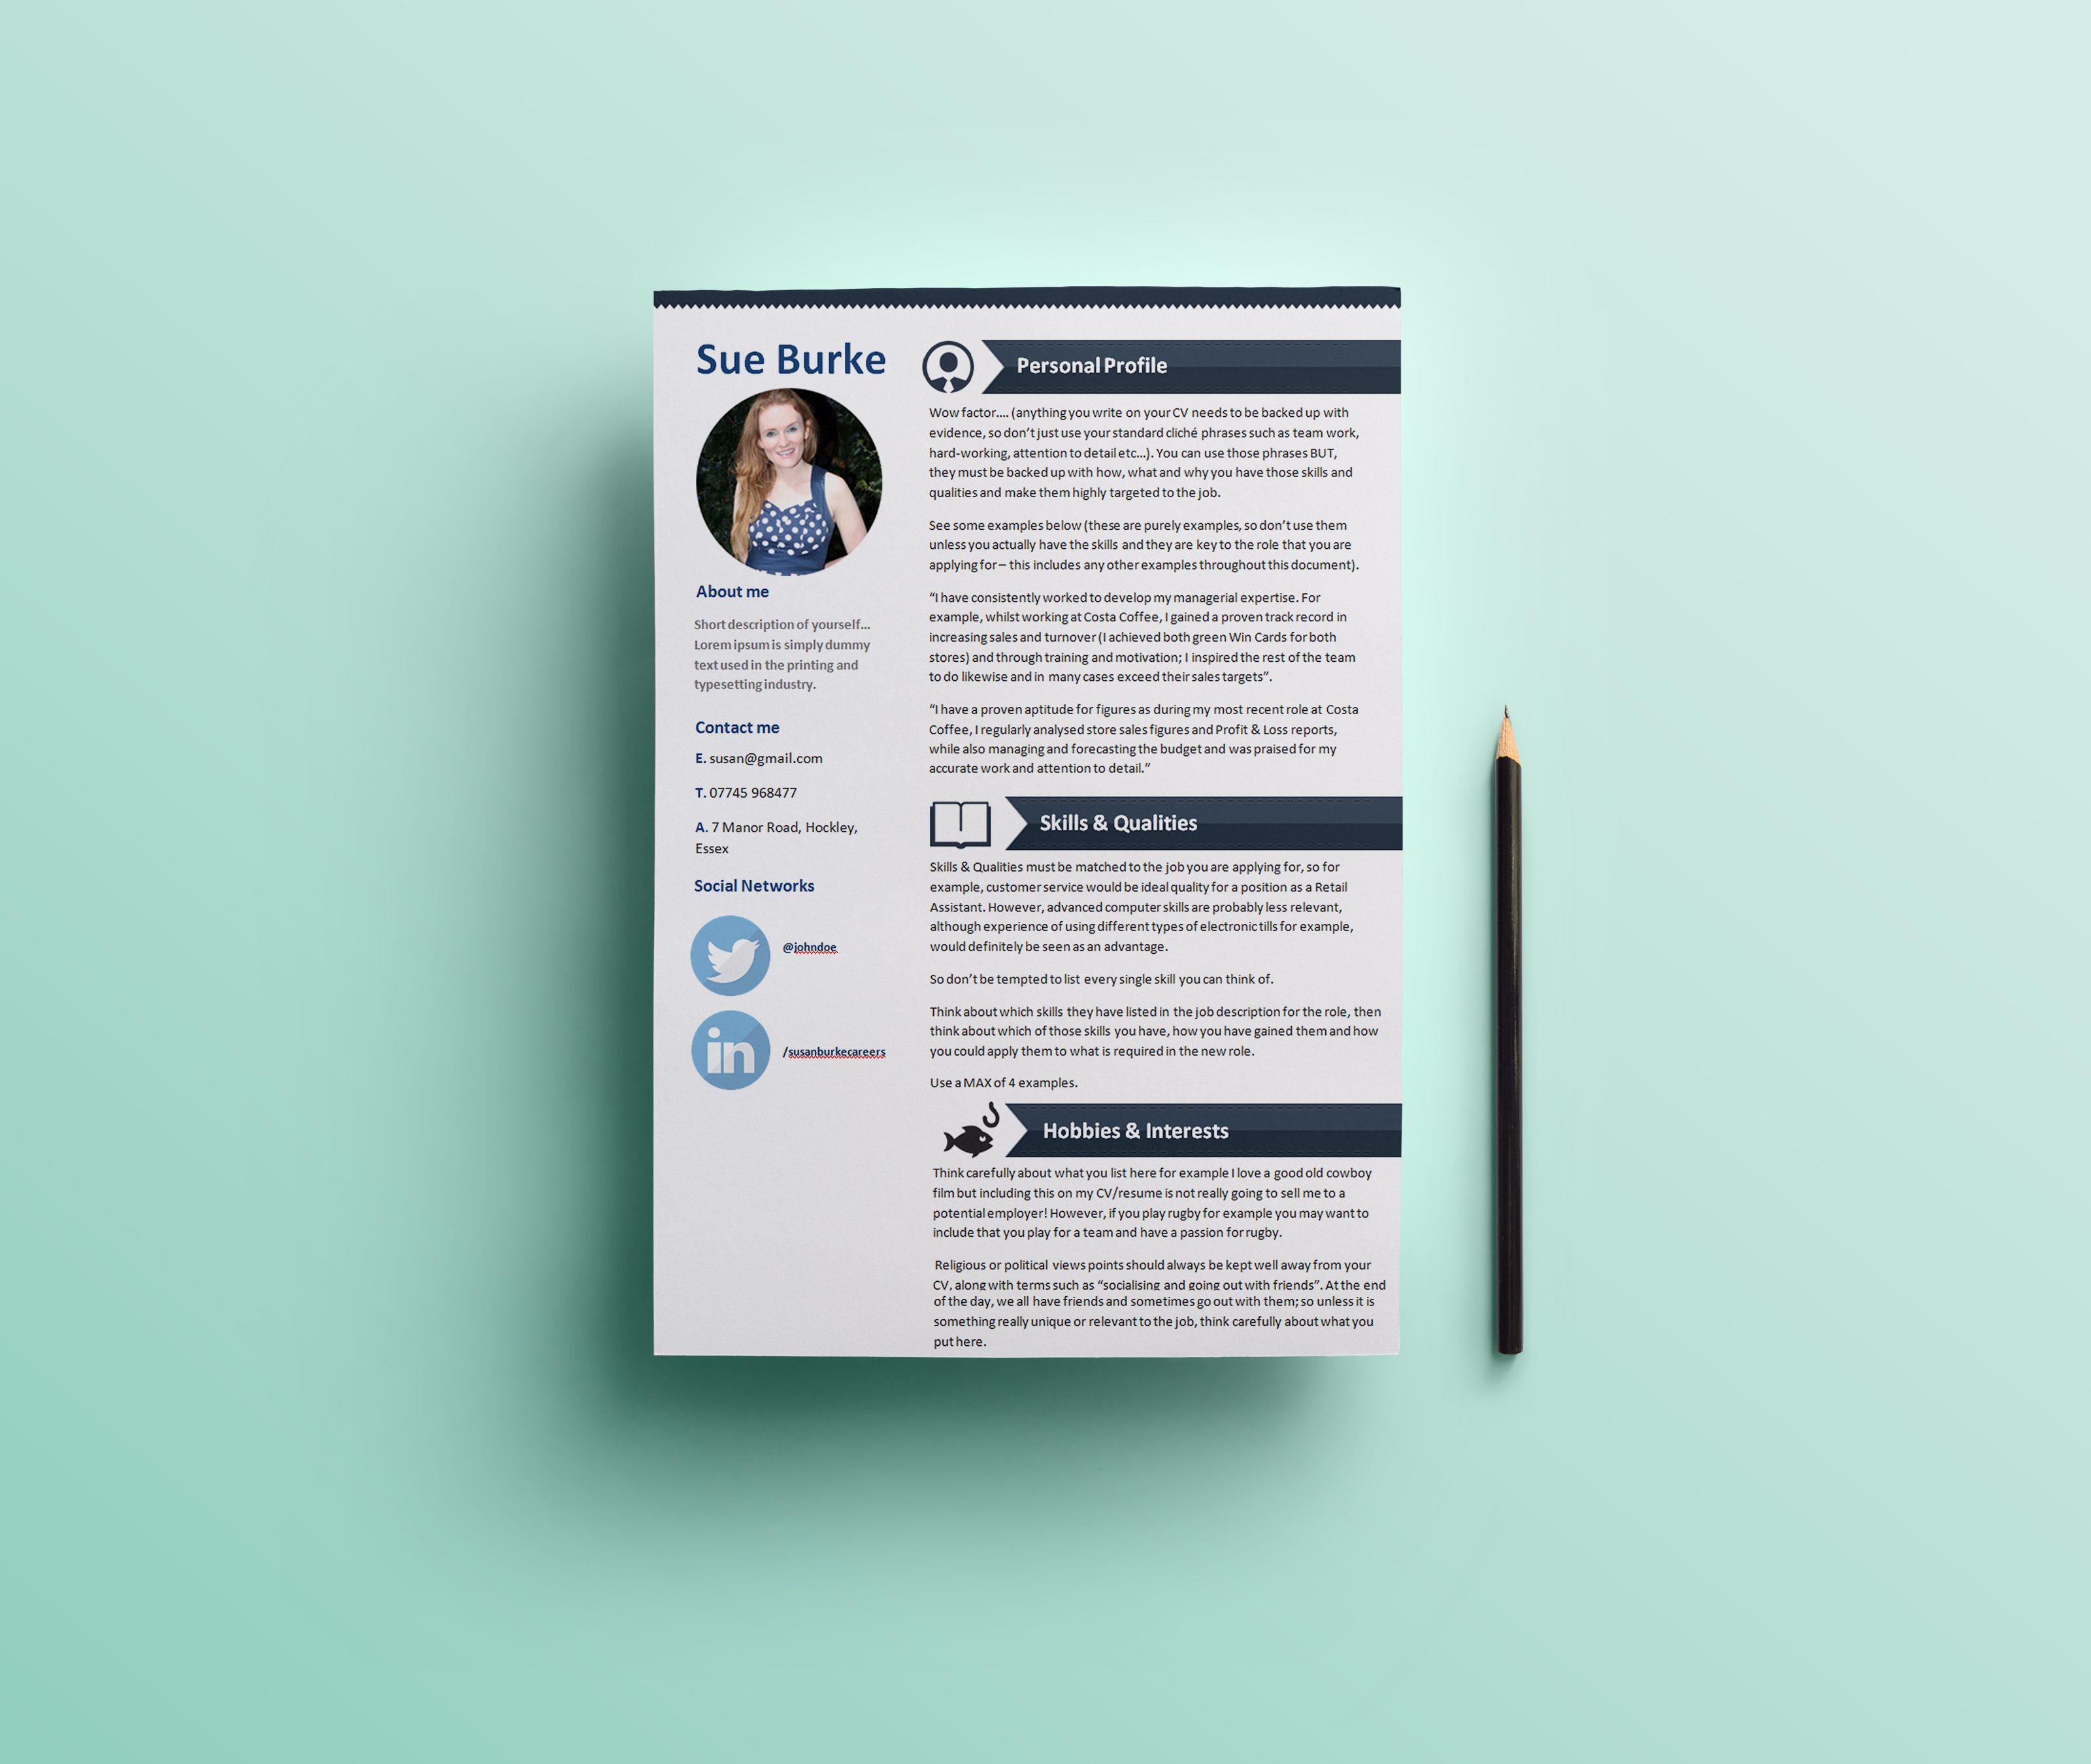 free job search tools linkedin success academy free creative